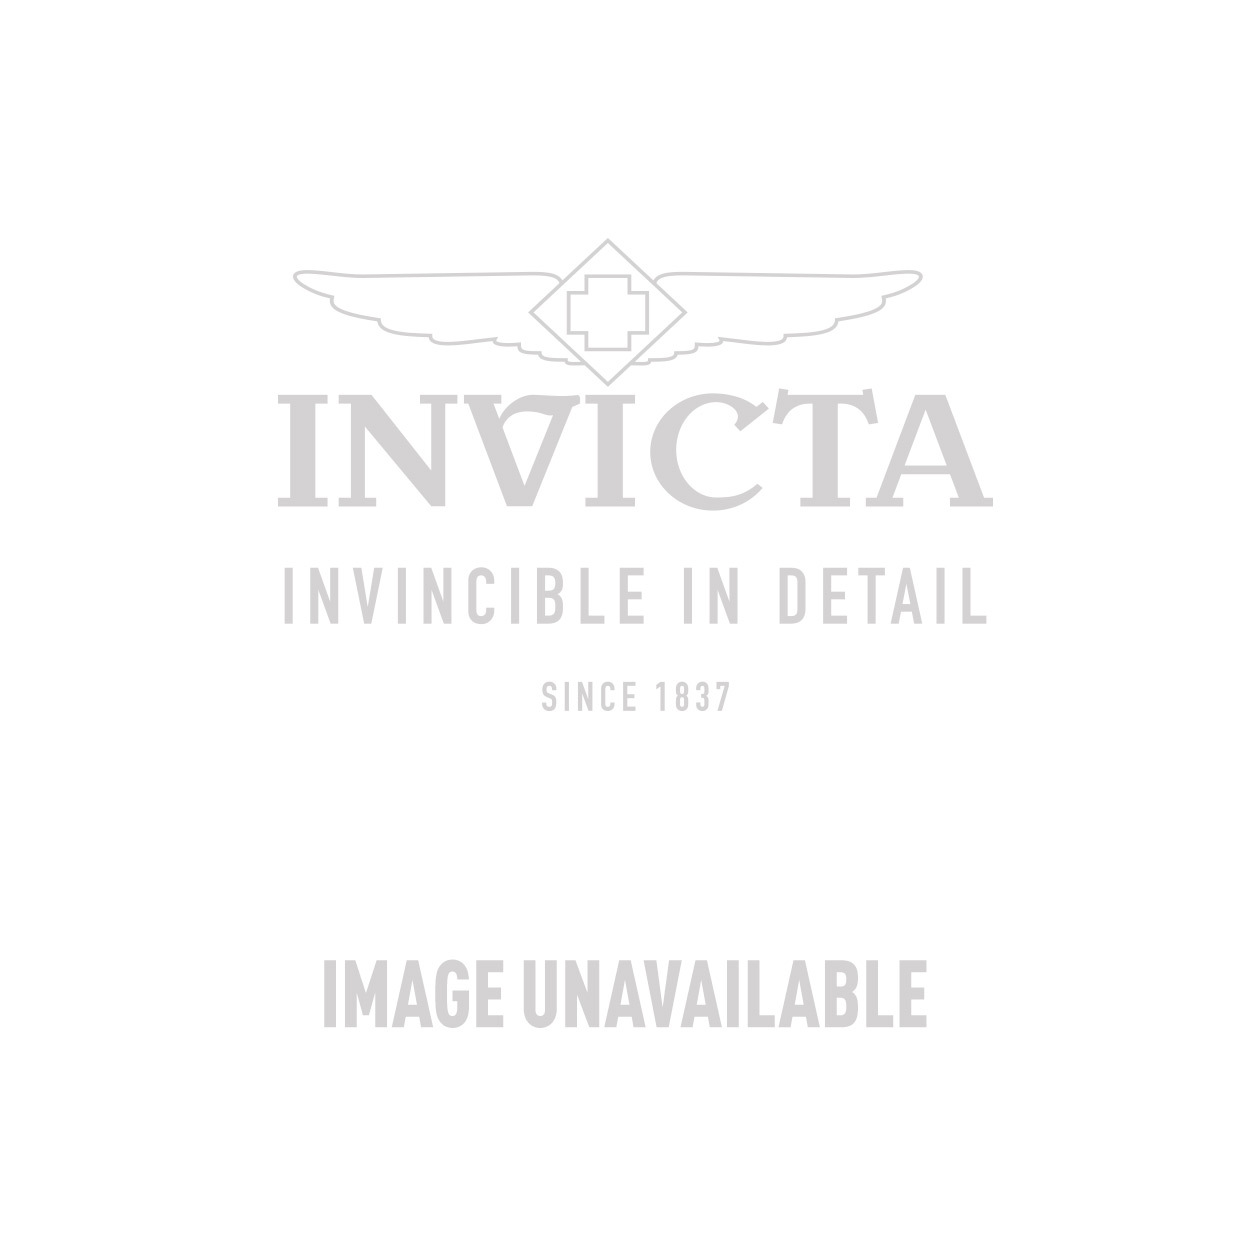 Invicta Sea Hunter Swiss Made Quartz Watch - Black case with Orange tone Polyurethane band - Model 1992